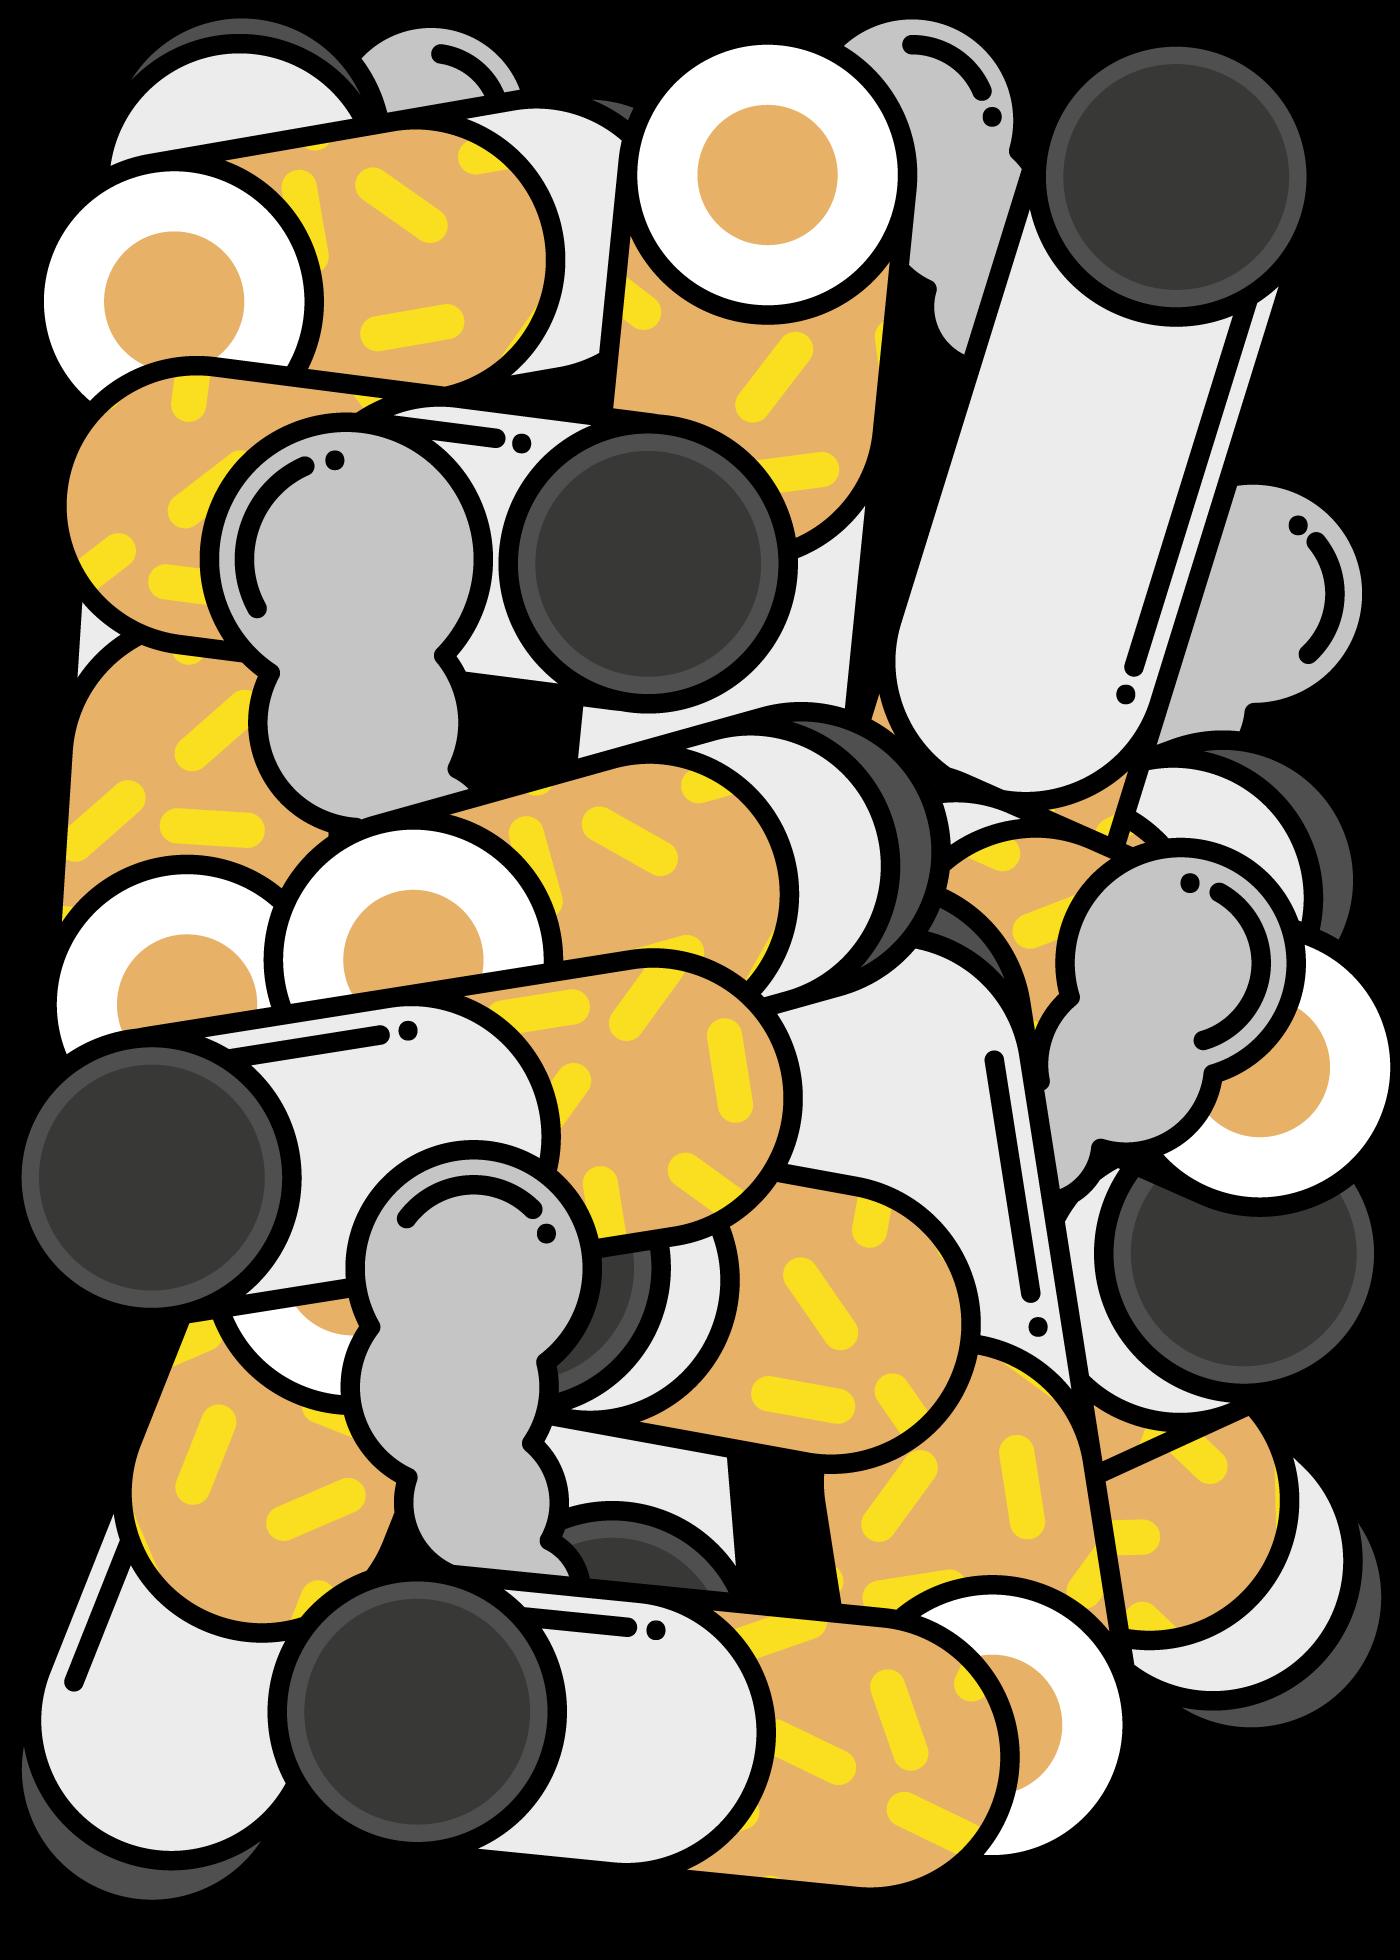 illustrator graphic designer jari johannes